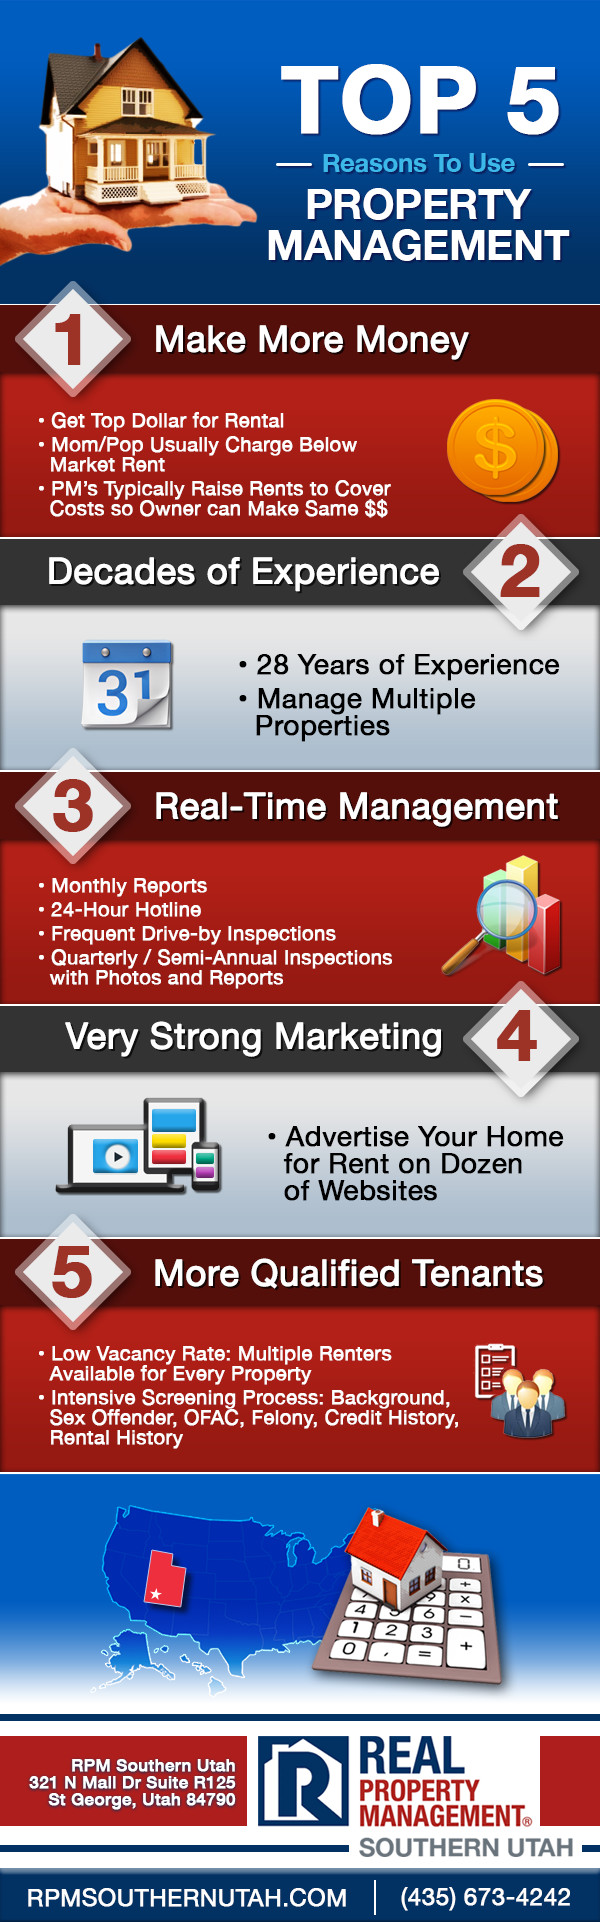 37 Rpm Southern Utah Ideas Property Management Management Company Management